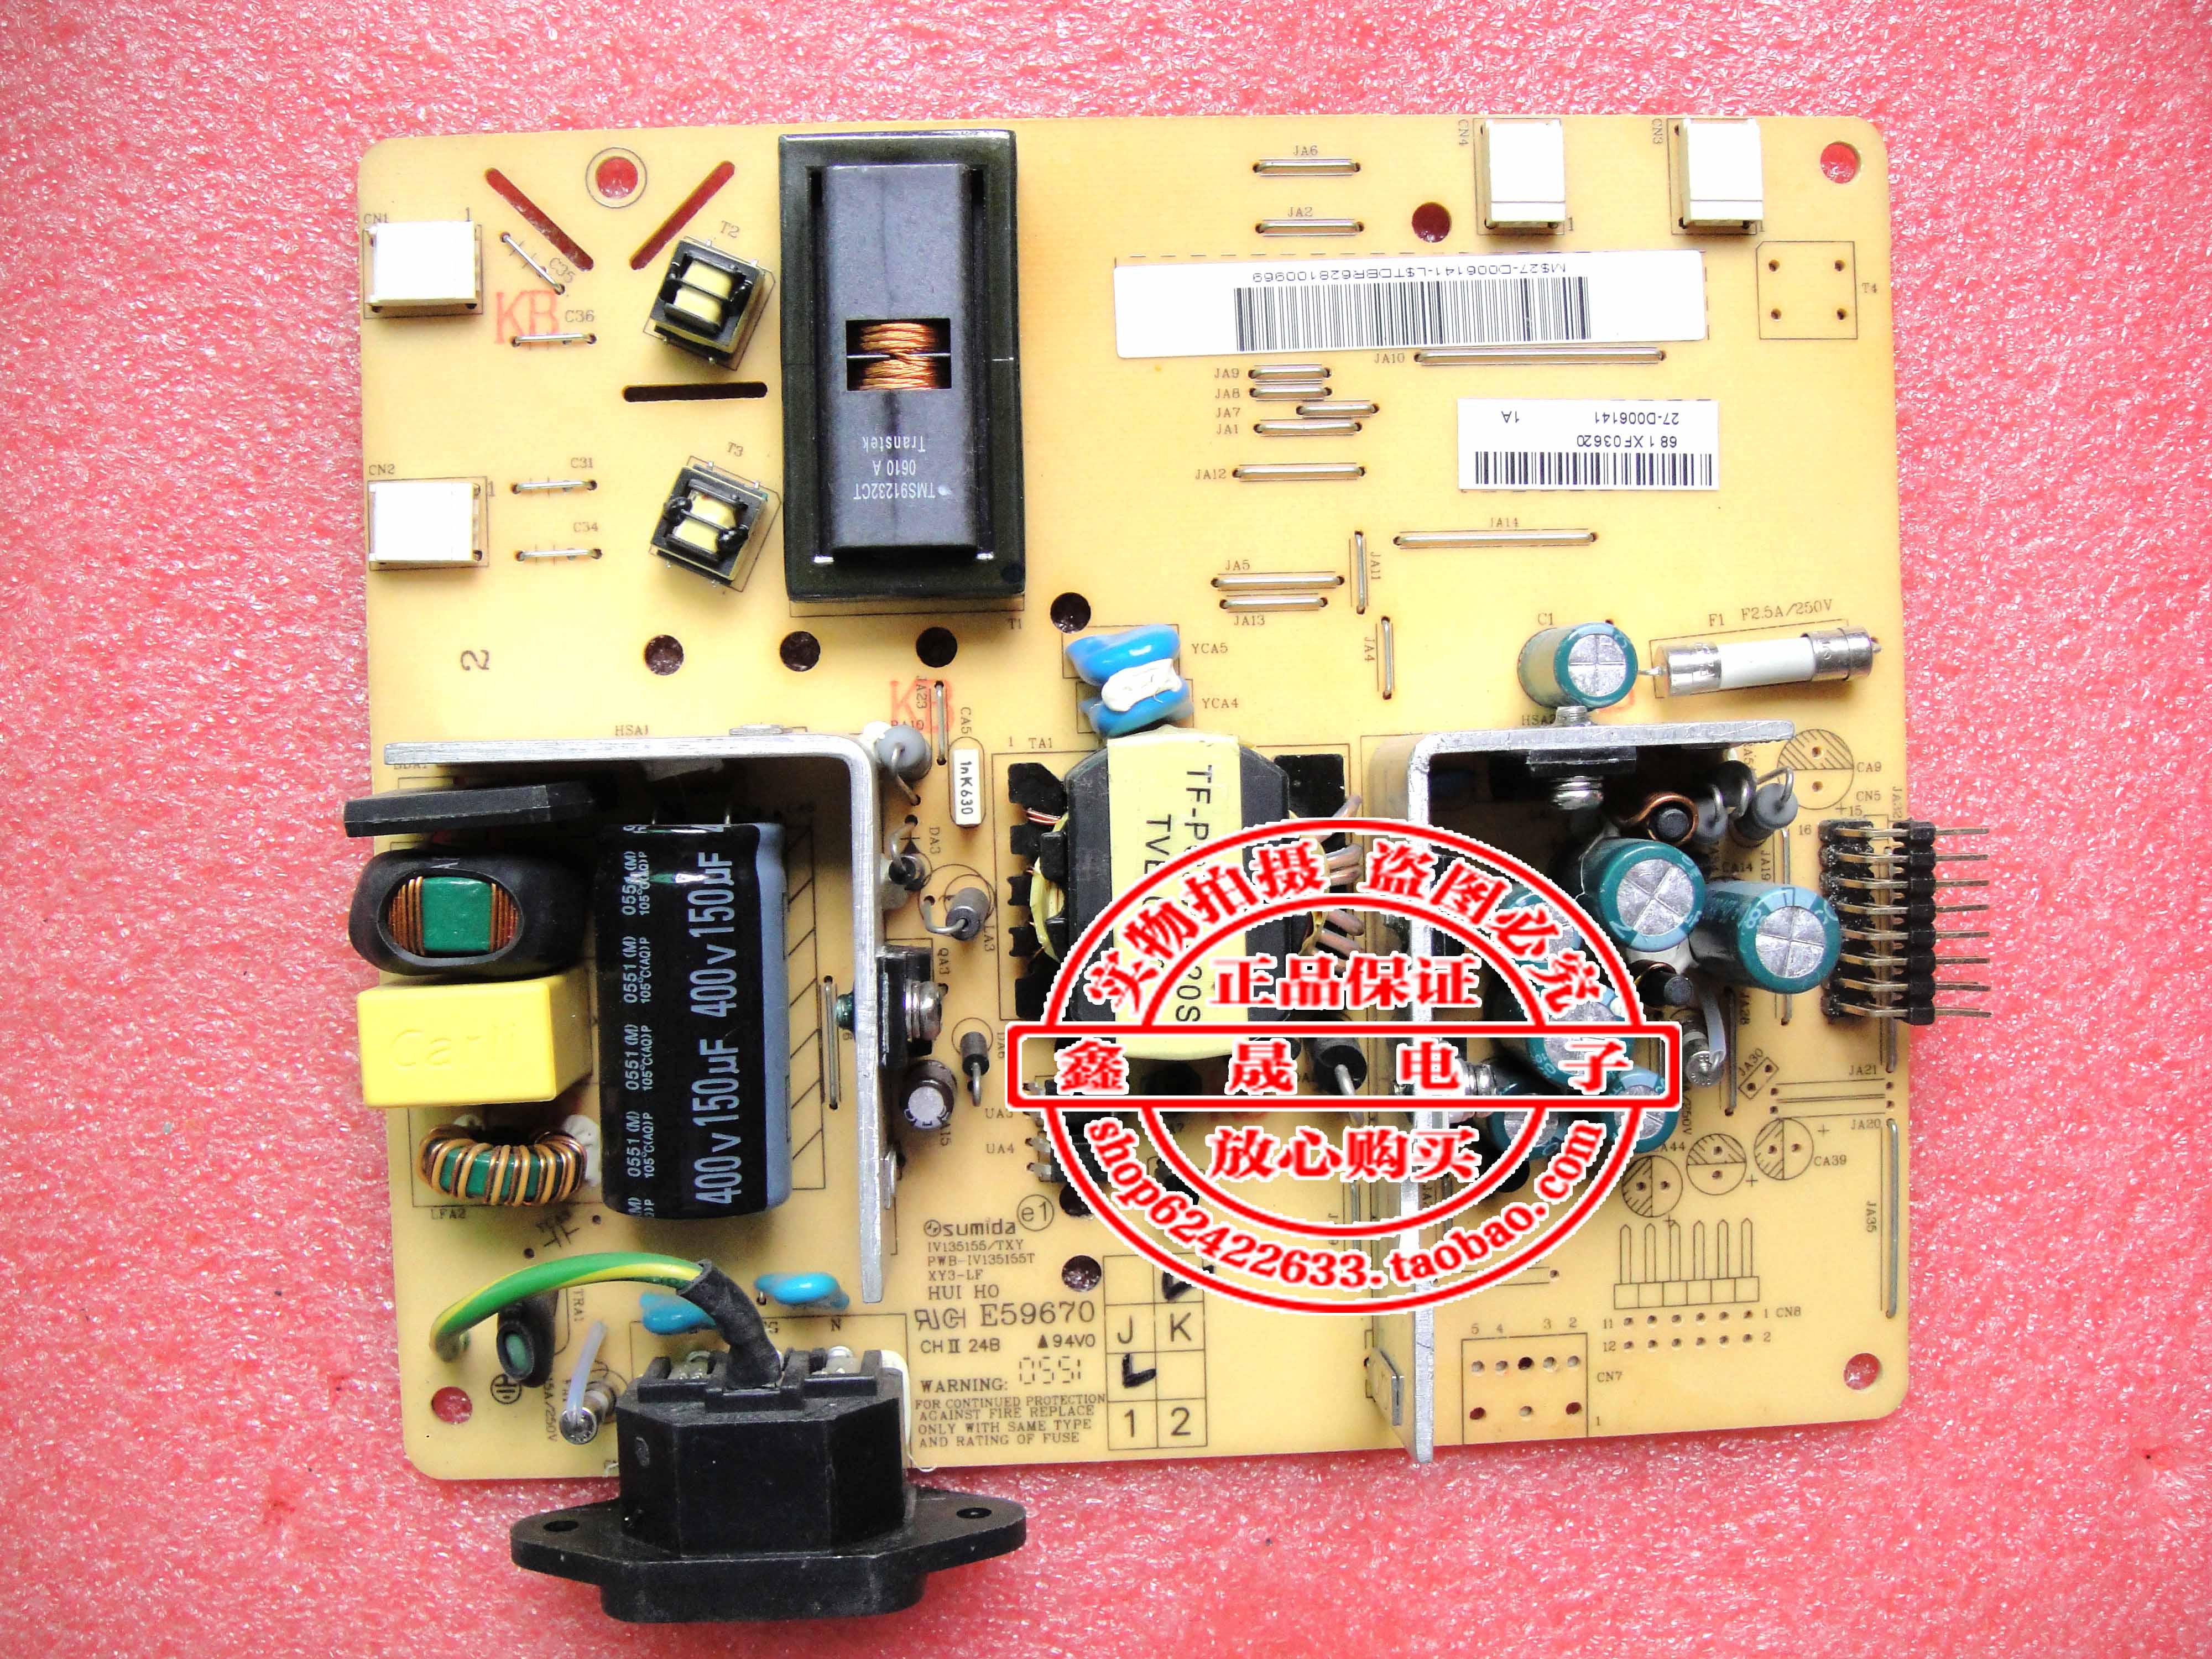 لوح طاقة VA1912WB PWB-IV135155T XY3-LF